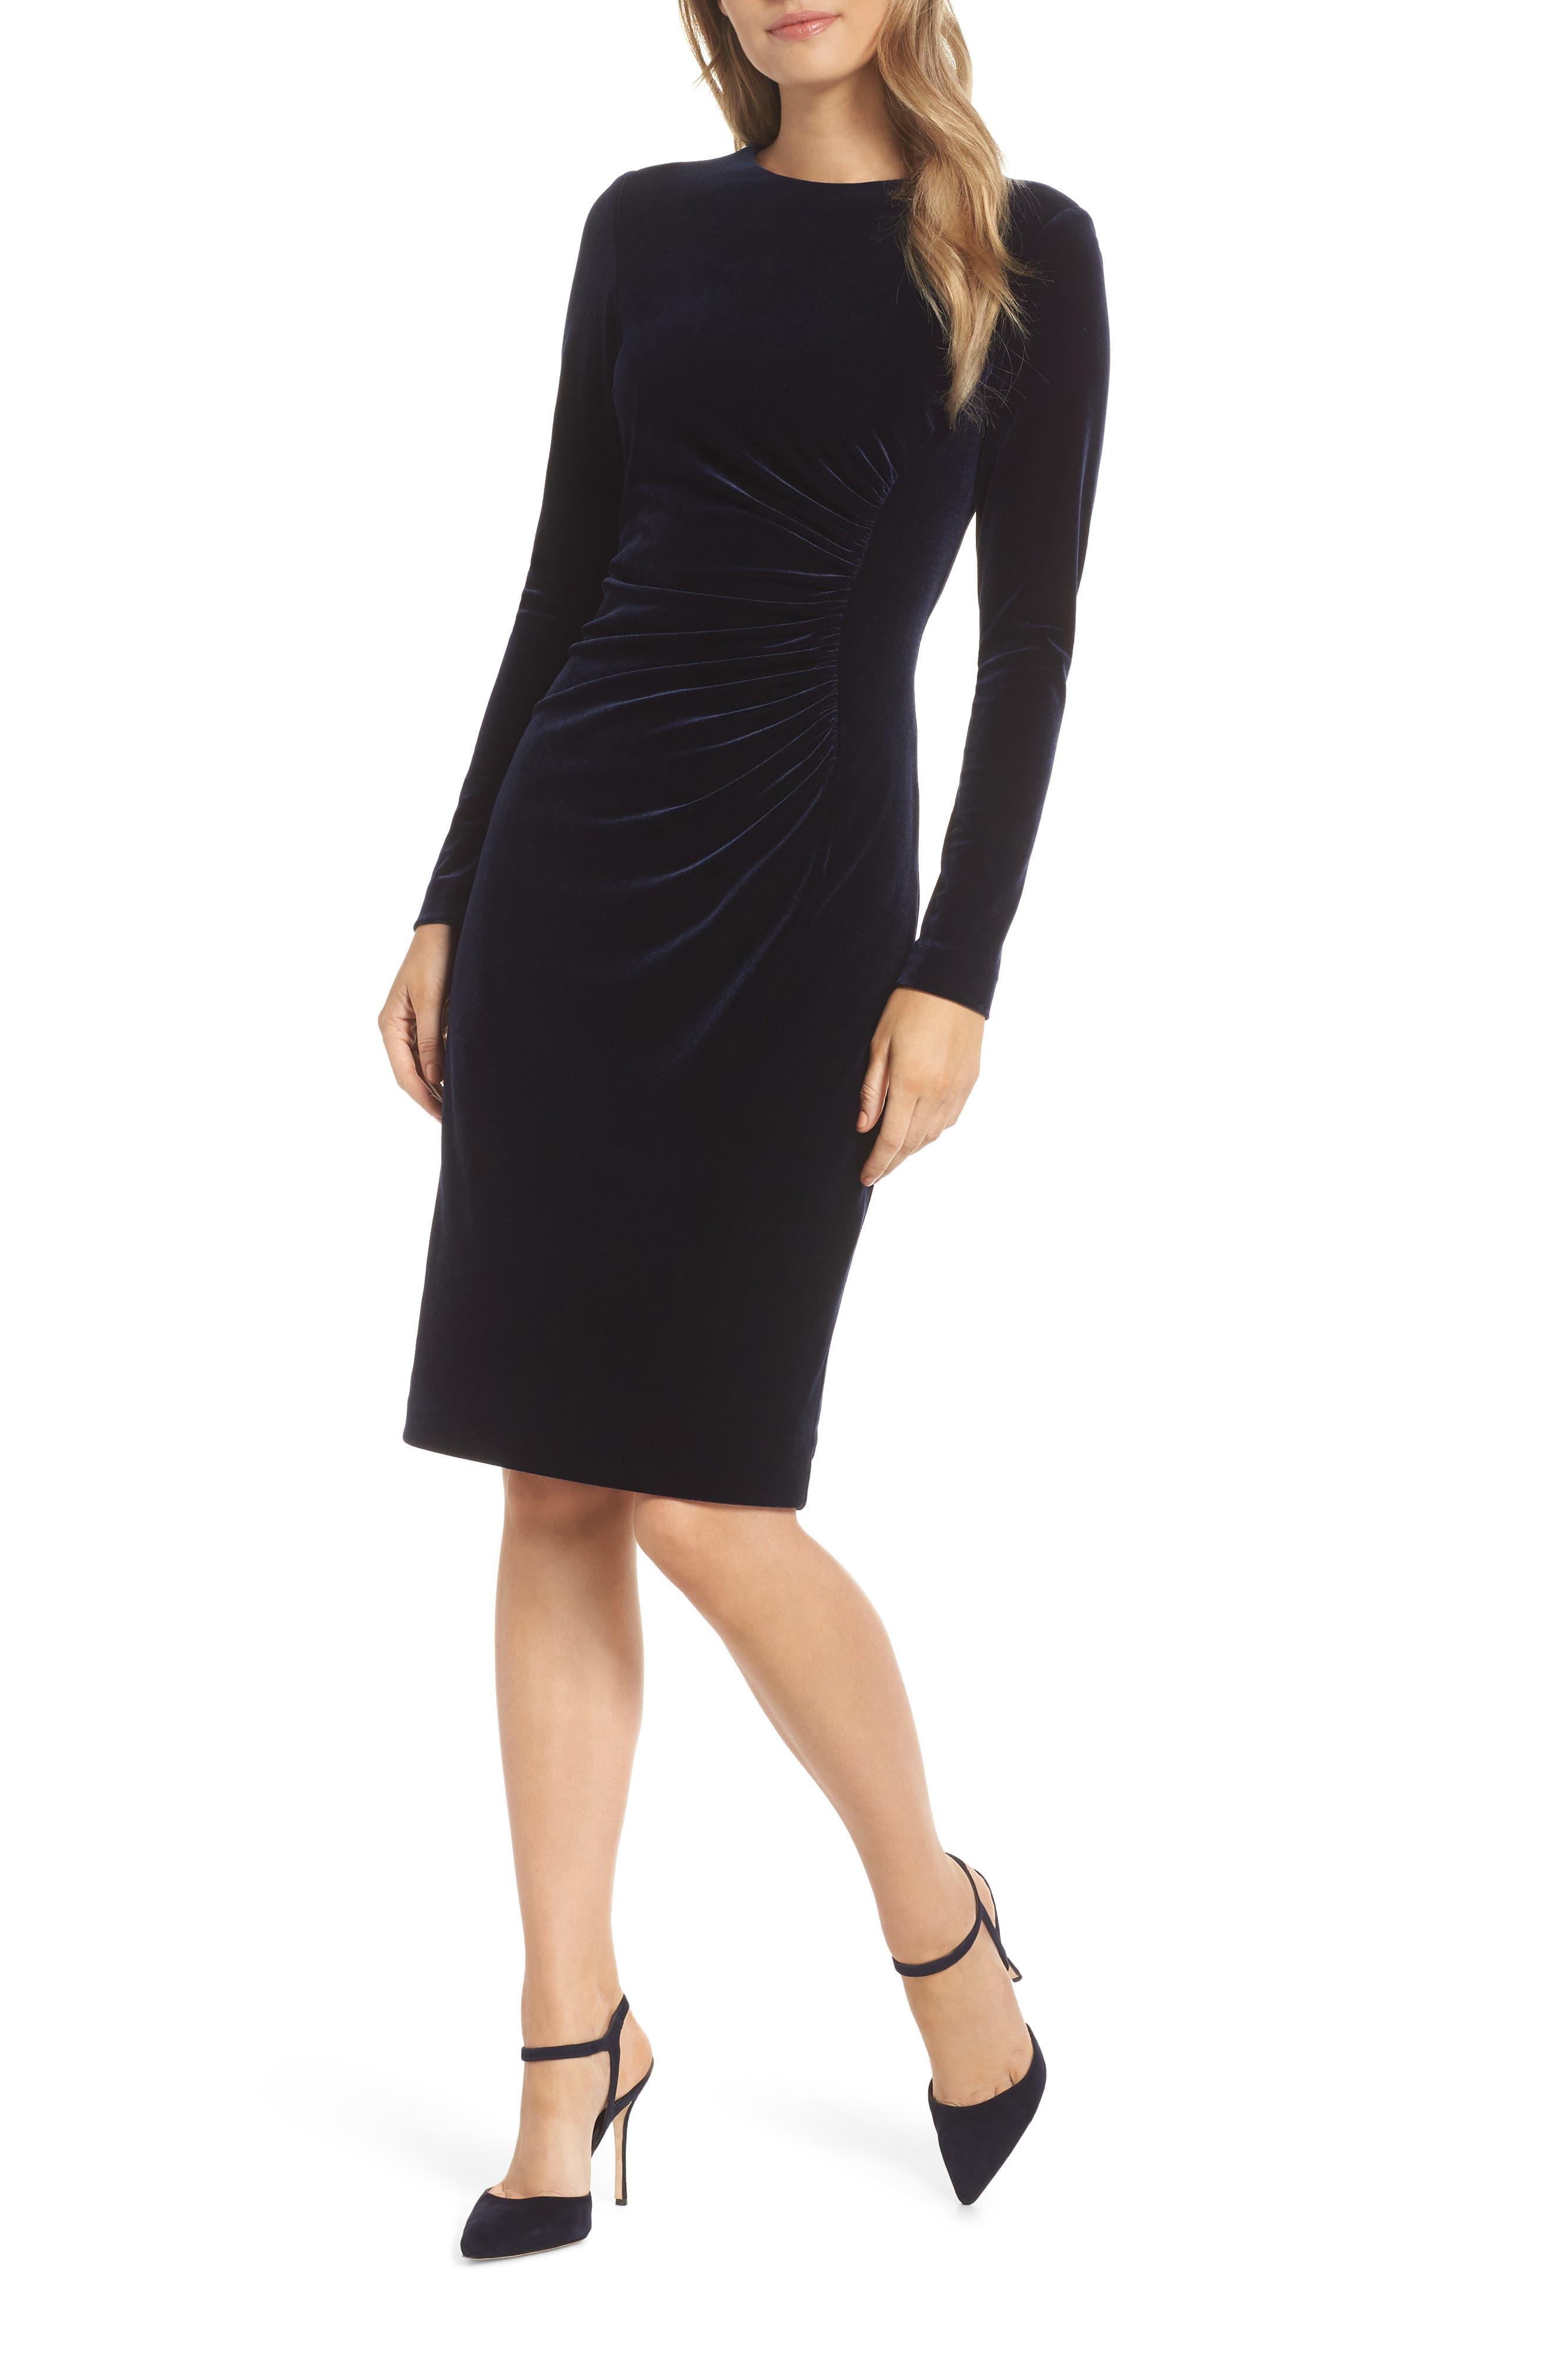 HARPER ROSE, Long Sleeve Body-Con Dress, Main thumbnail 1, color, 410